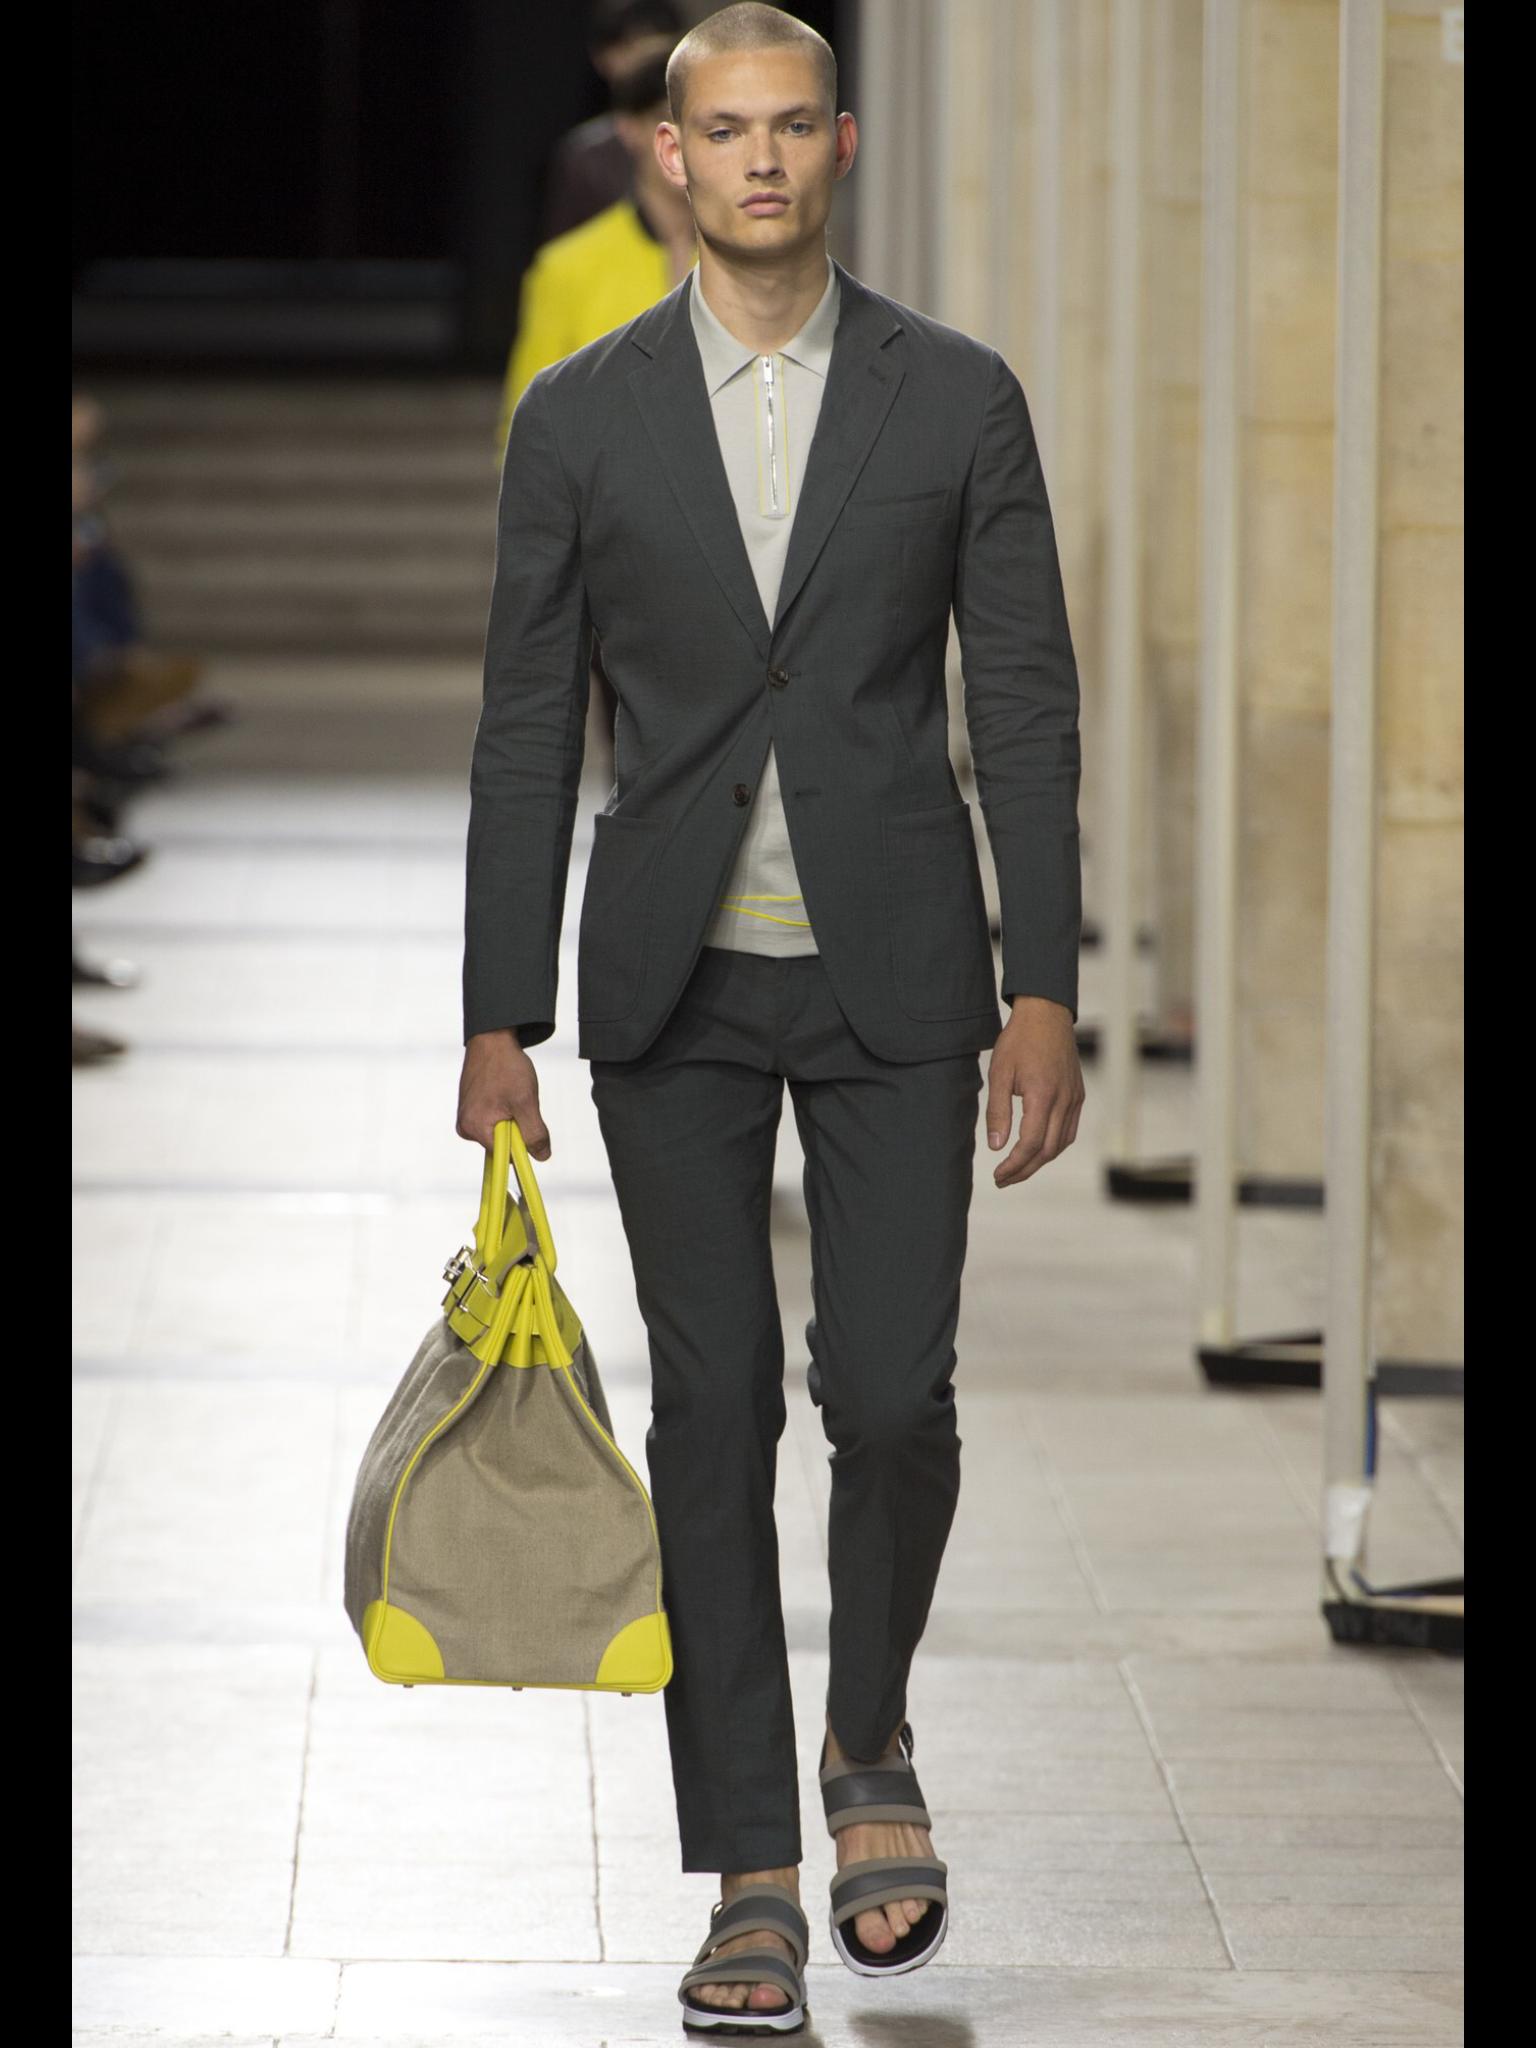 Hermès Spring 2017 Menswear collection. Menswear